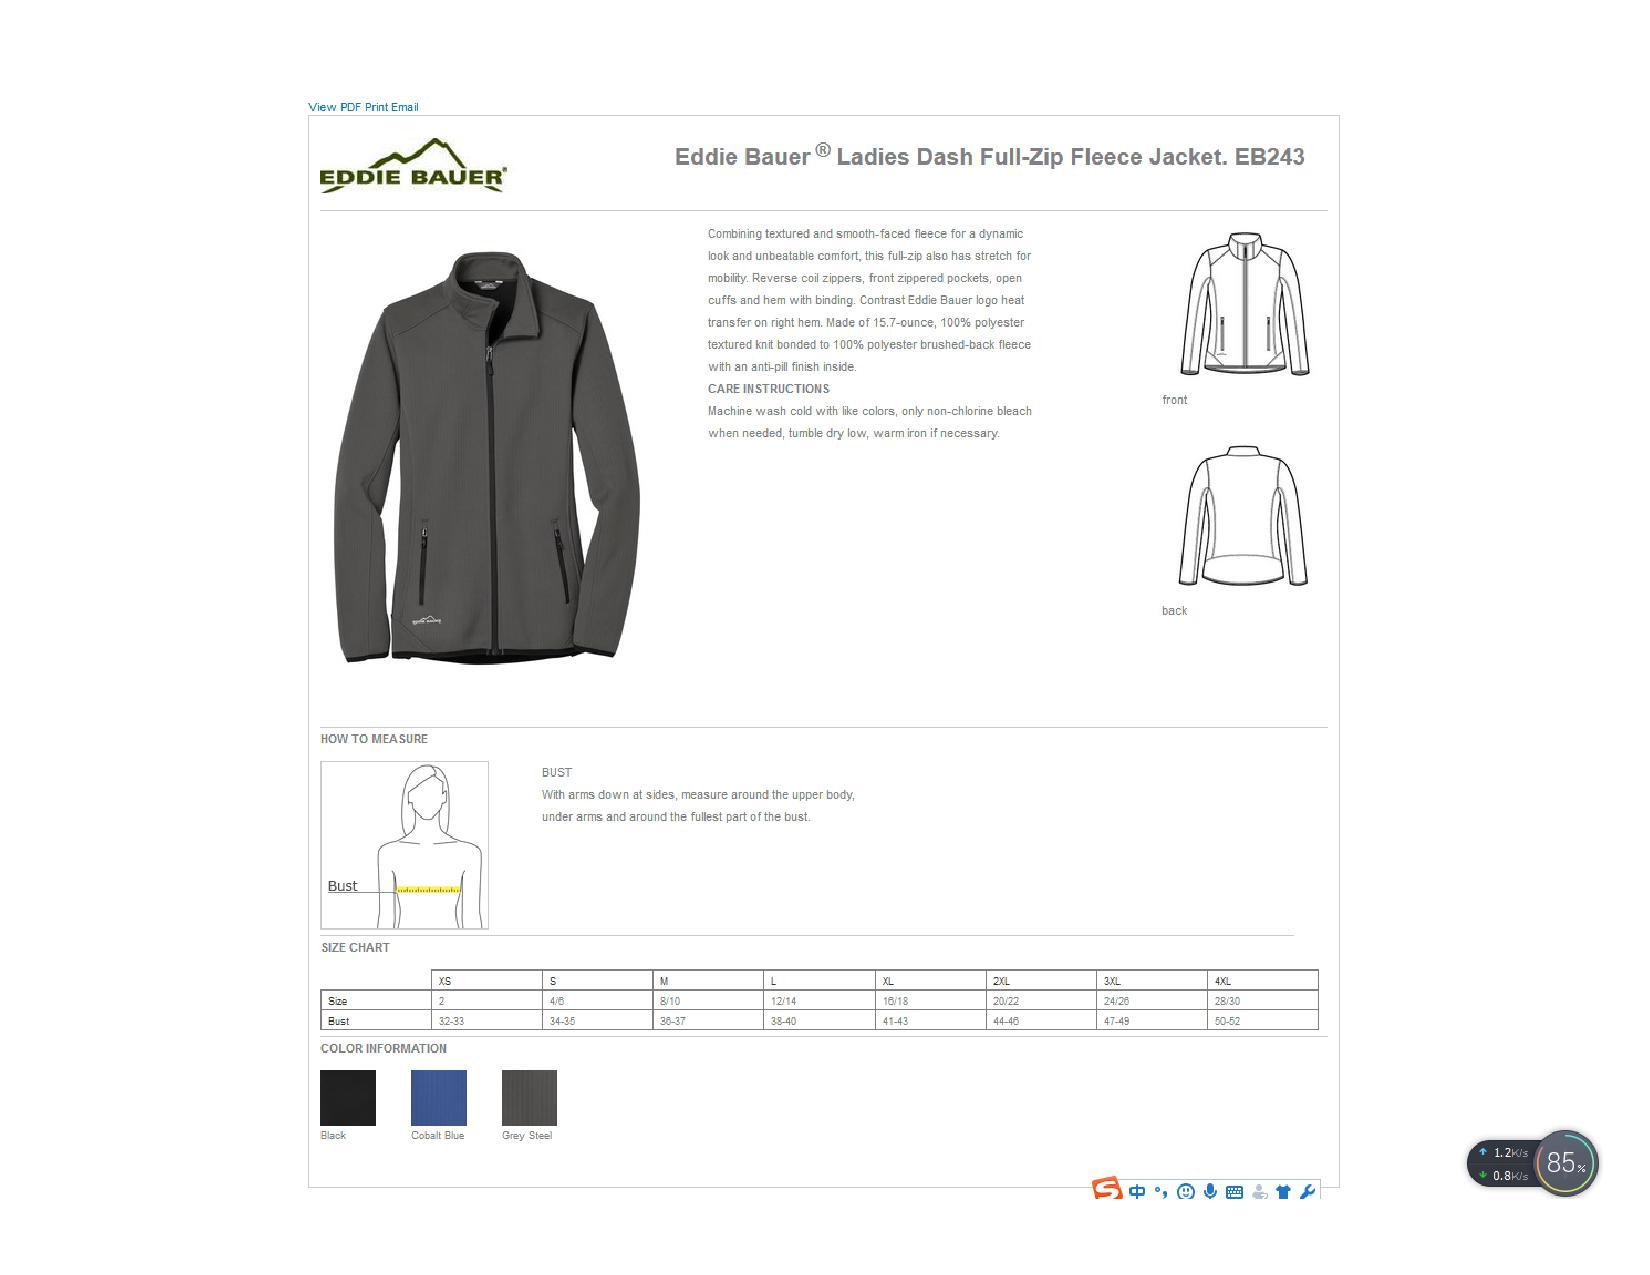 9df01b04993 Eddie Bauer EB243 - Ladies Dash Full-Zip Fleece Jacket  53.98 ...